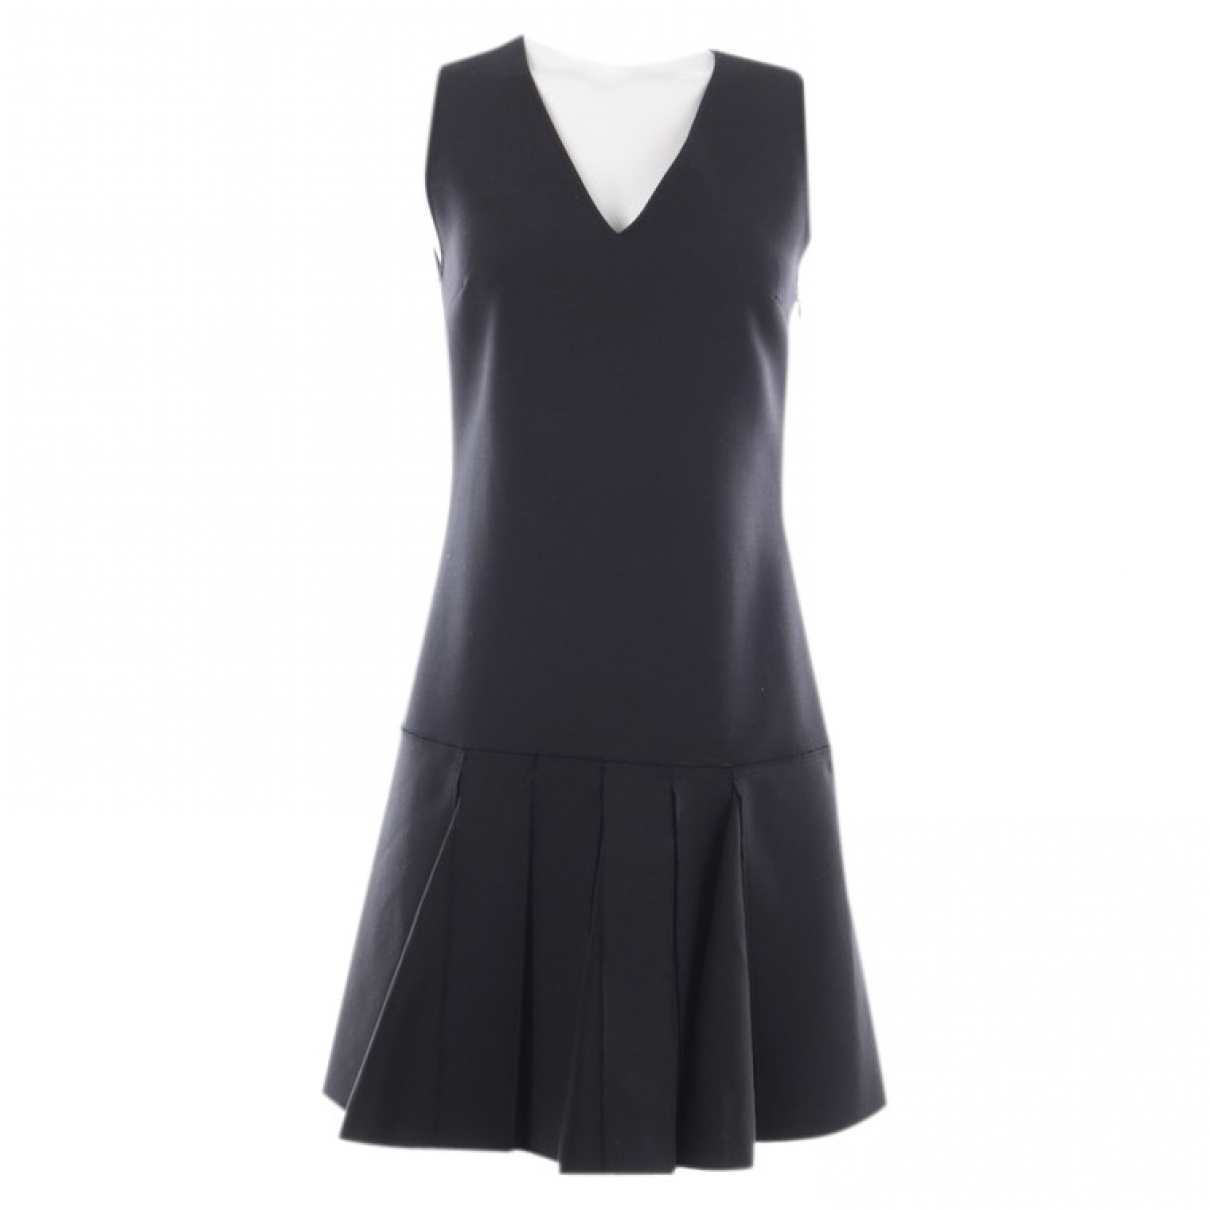 Dorothee Schumacher \N Black dress for Women 36 FR